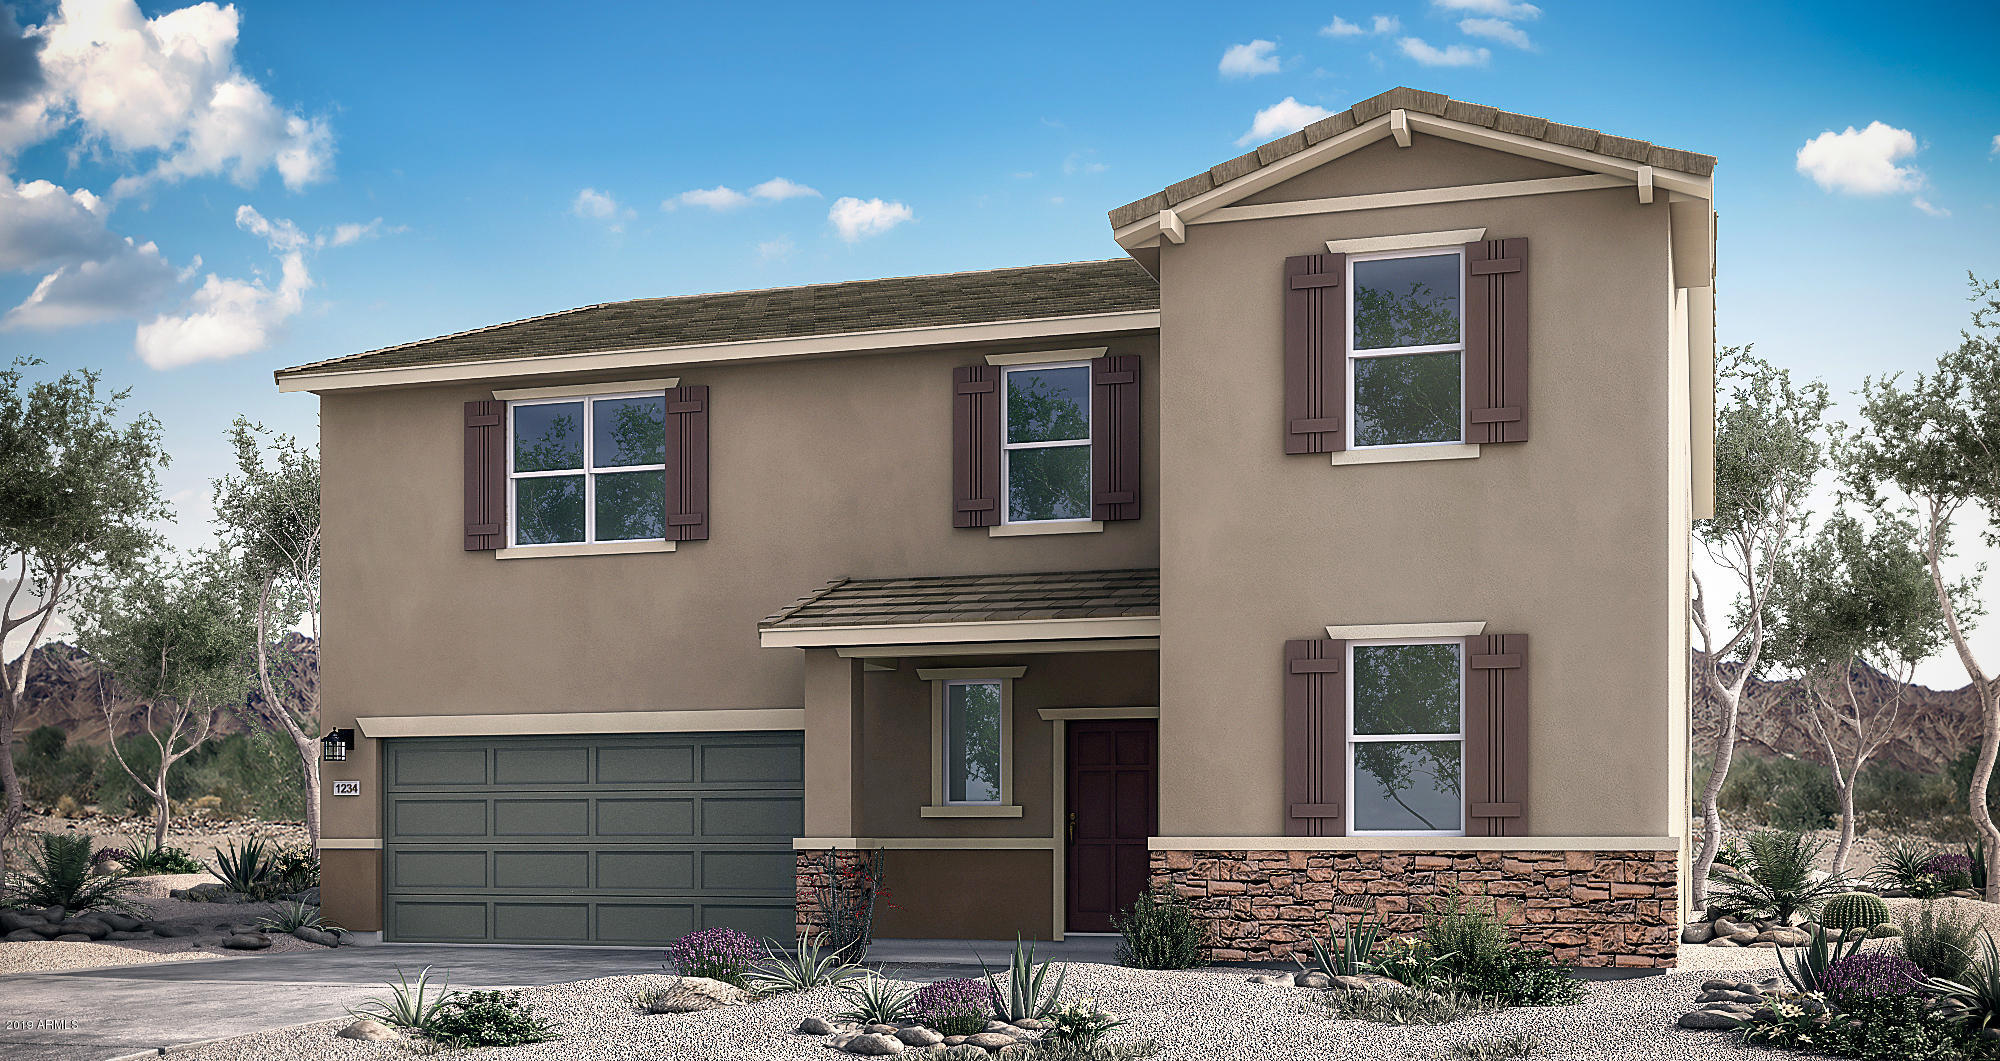 Photo of 3323 W Carter Road, Phoenix, AZ 85041